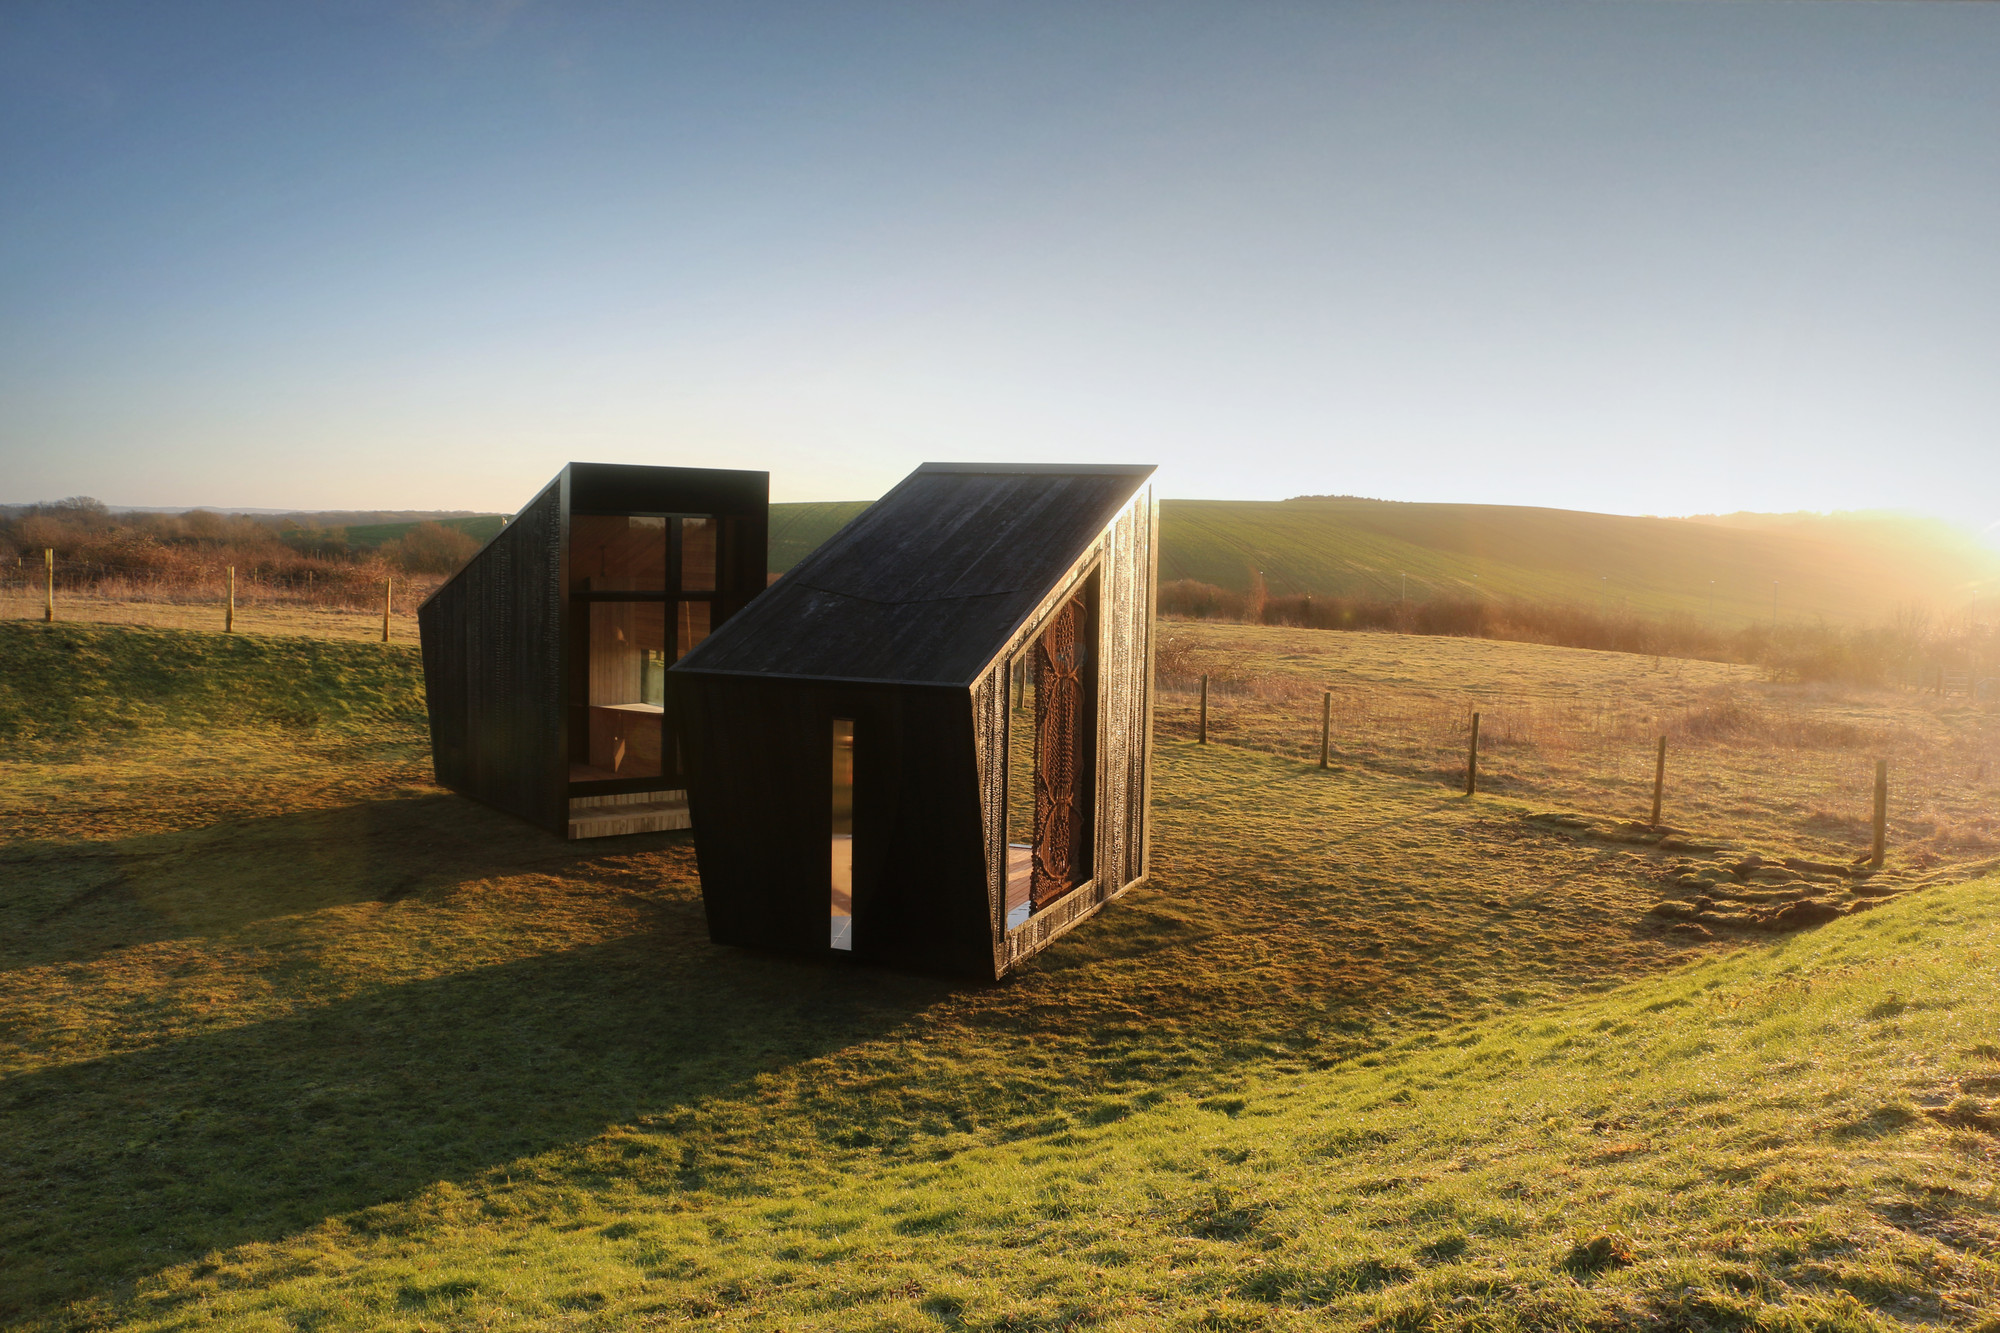 The Observatories: Micro-residência artística é oficialmente inaugurada no Reino Unido, © Feilden Clegg Bradley Studios